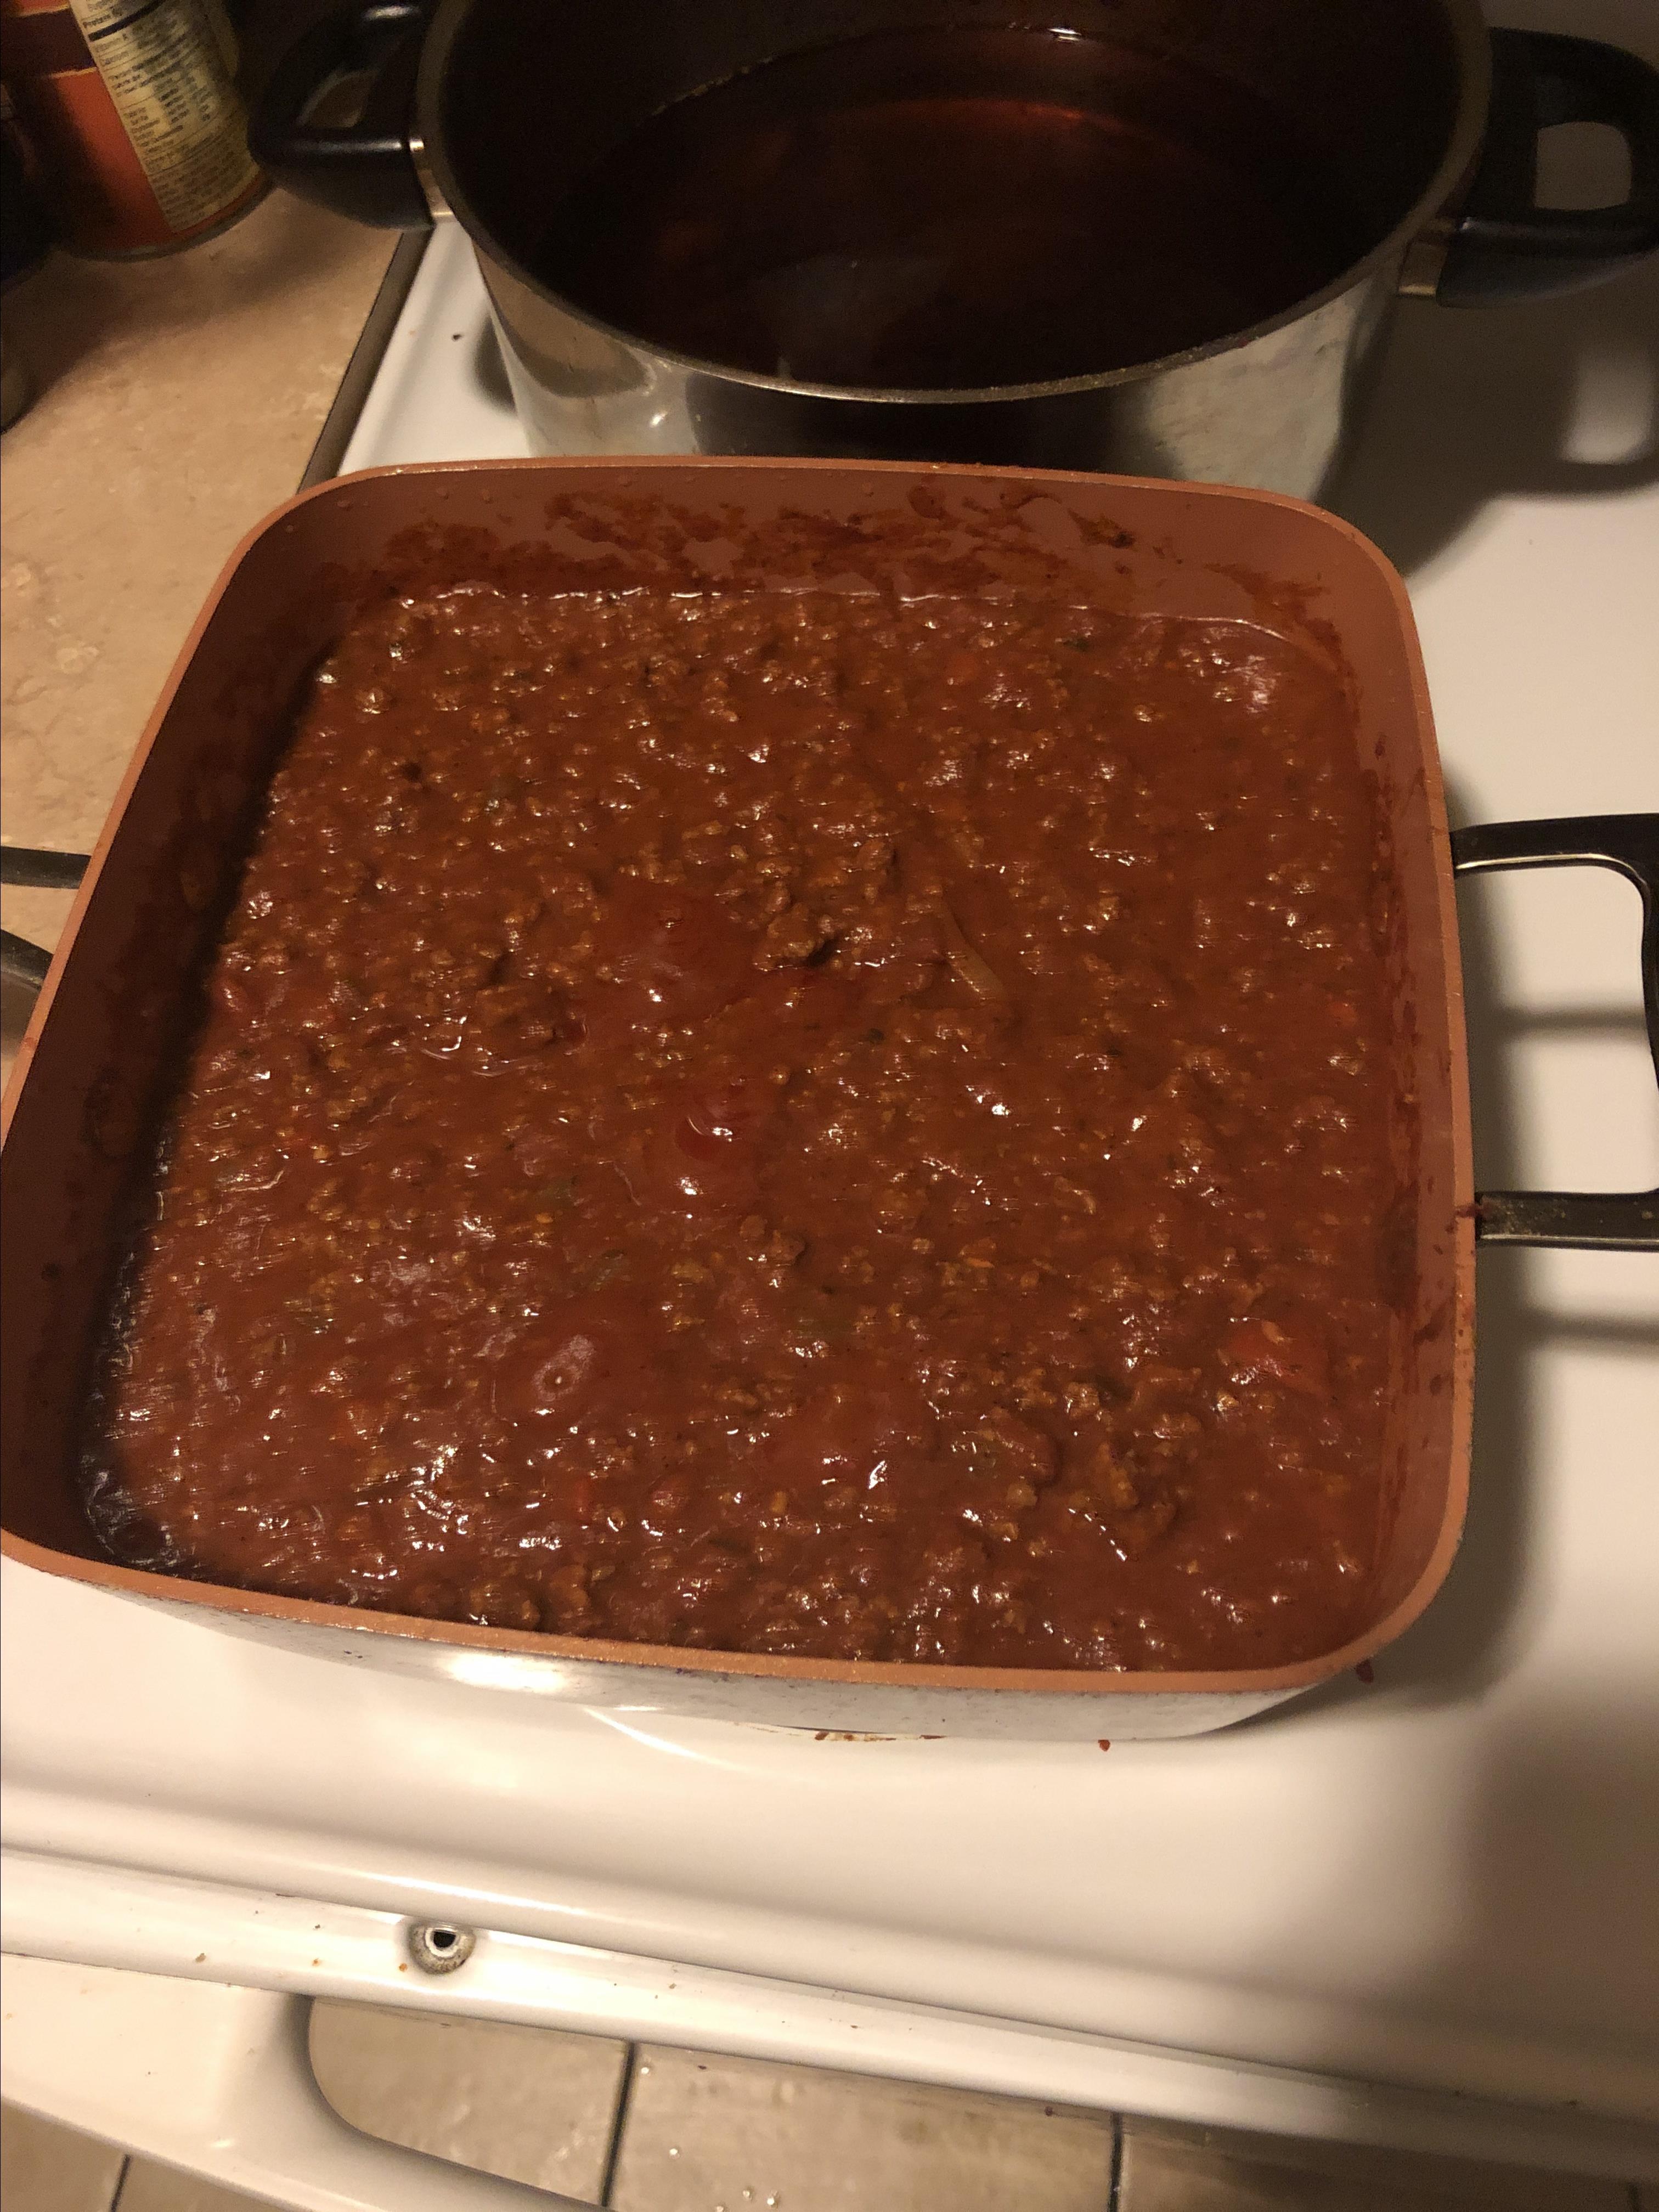 Easy Homemade Chili Michael Jointer